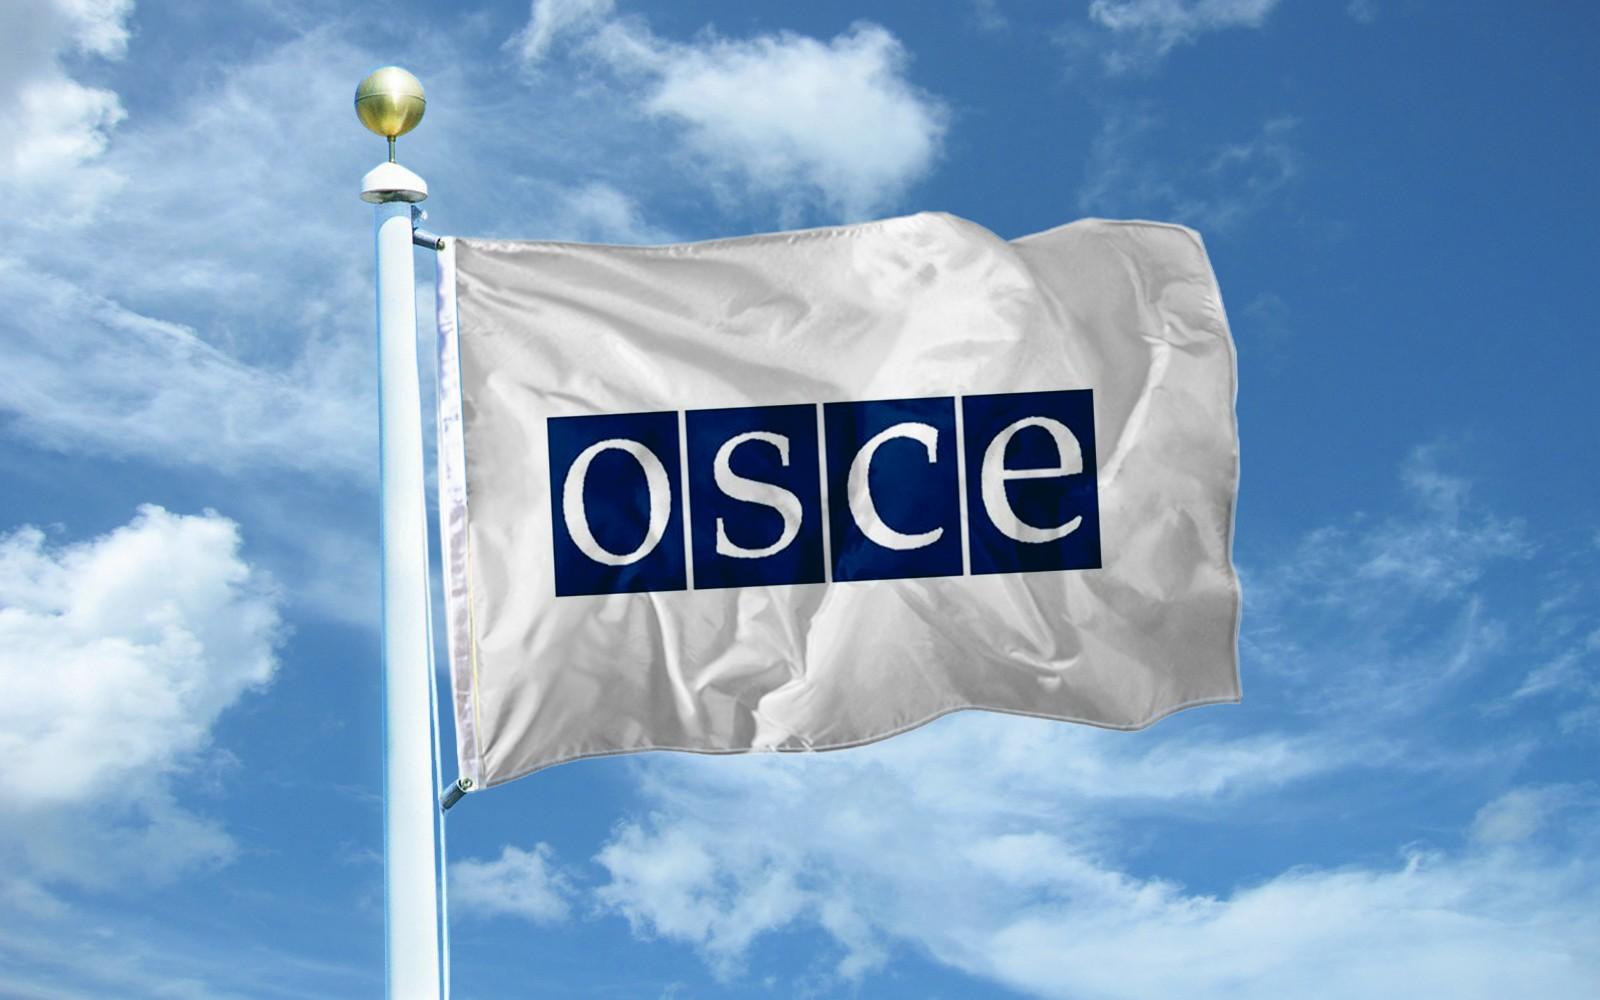 Руководитель МИД Грузии обсудил спредседателем ОБСЕ урегулировании конфликтов врегионе